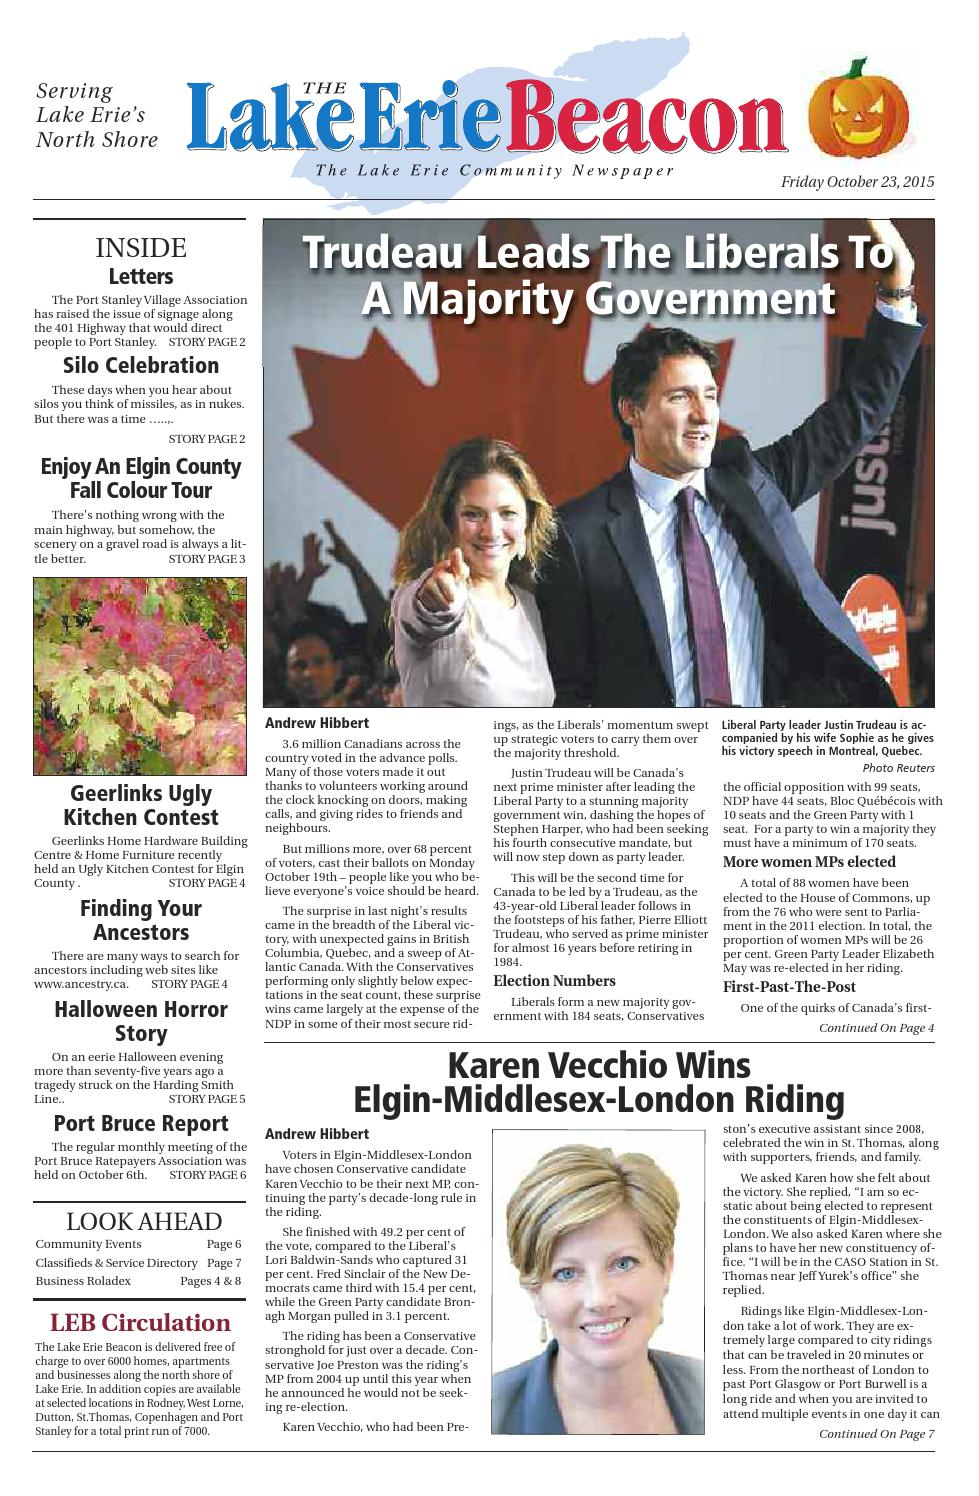 . The Lake Erie Beacon October 23 2015 by Linda Hibbert   issuu